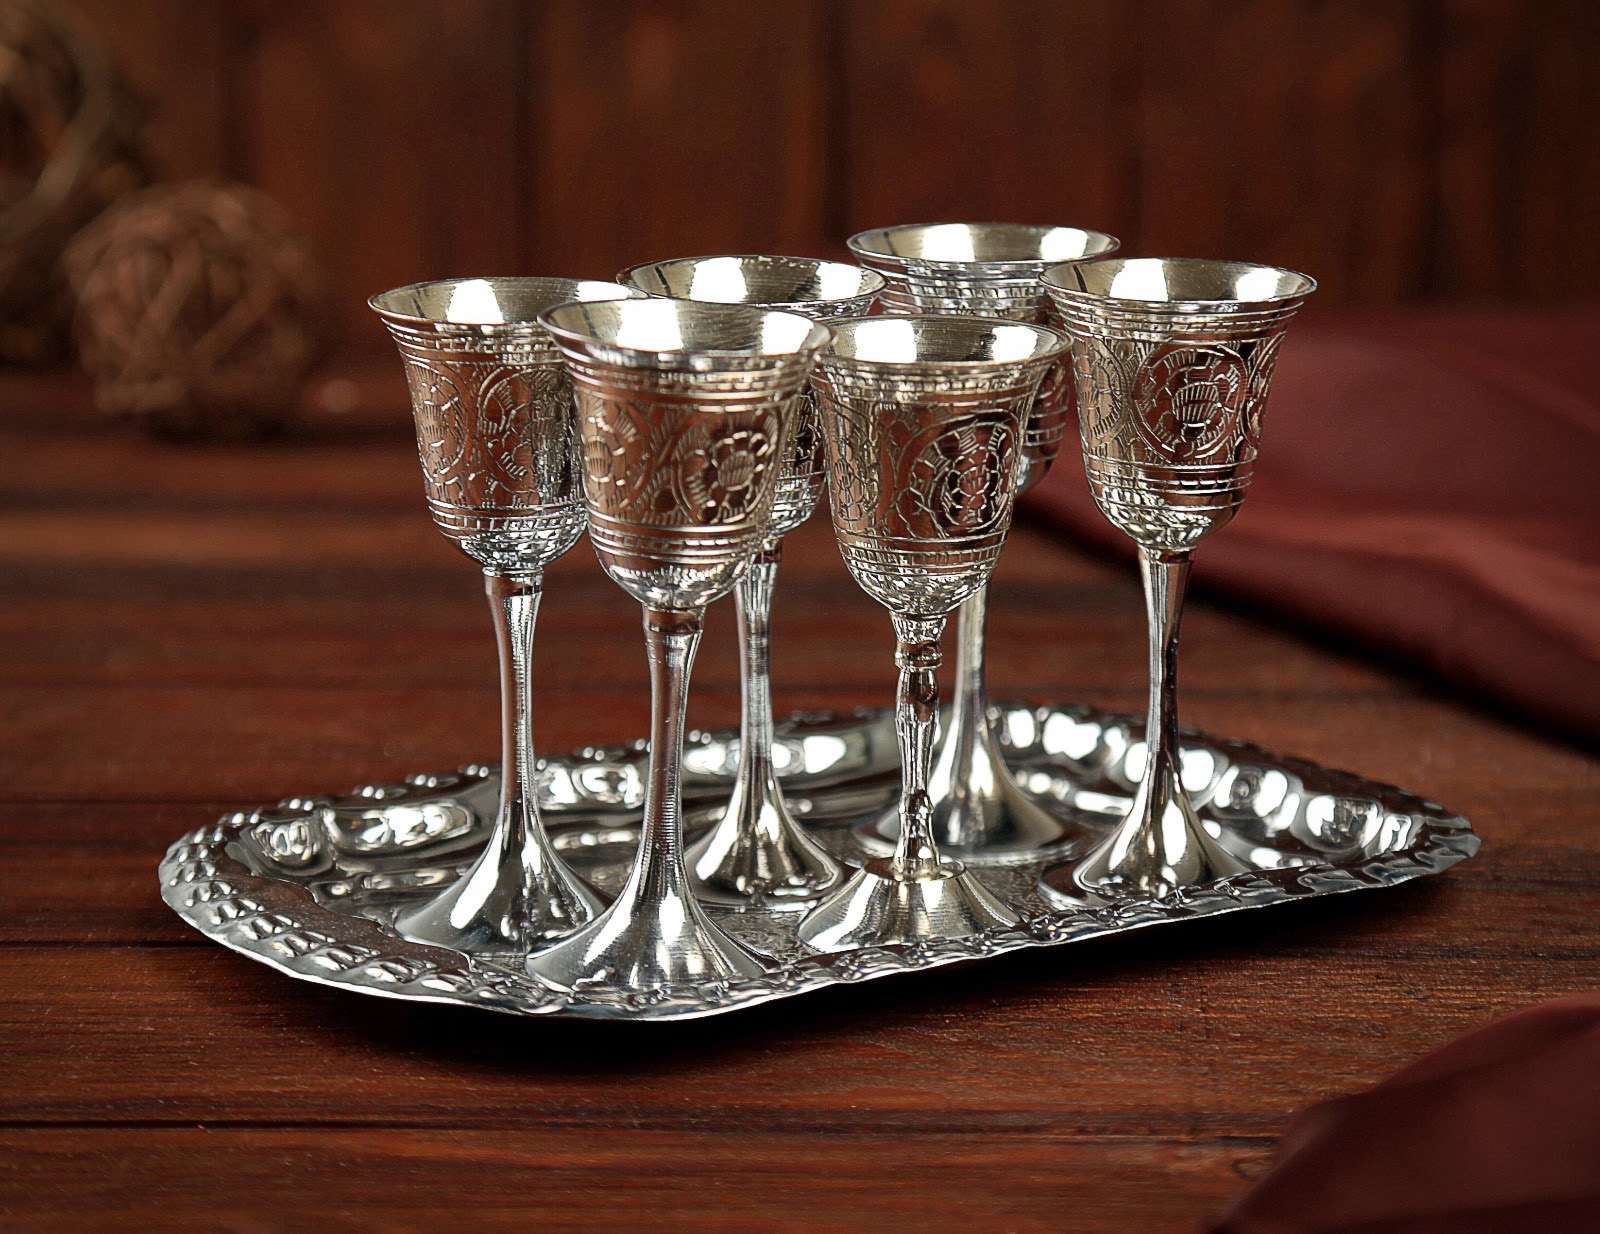 Серебряные рюмки на столе